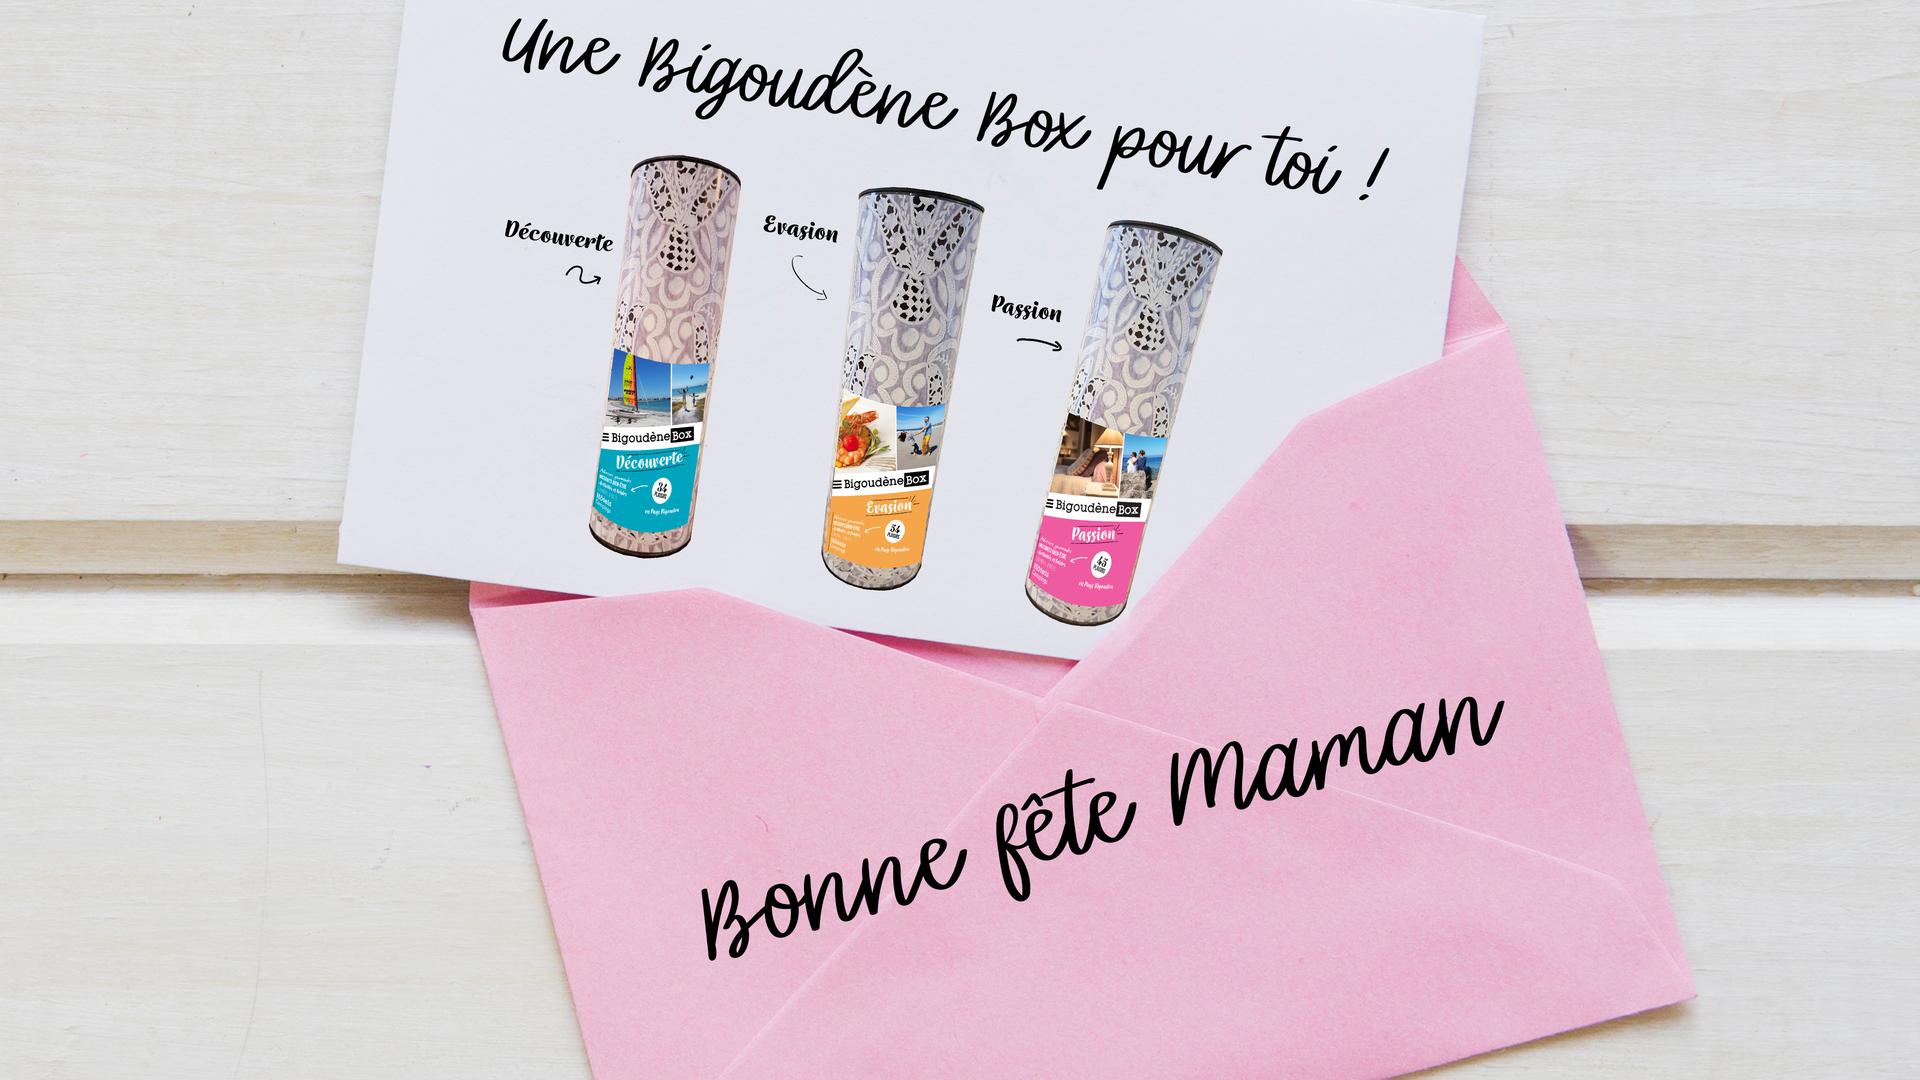 Offrez la Bigoudène Box pour la fête des mères